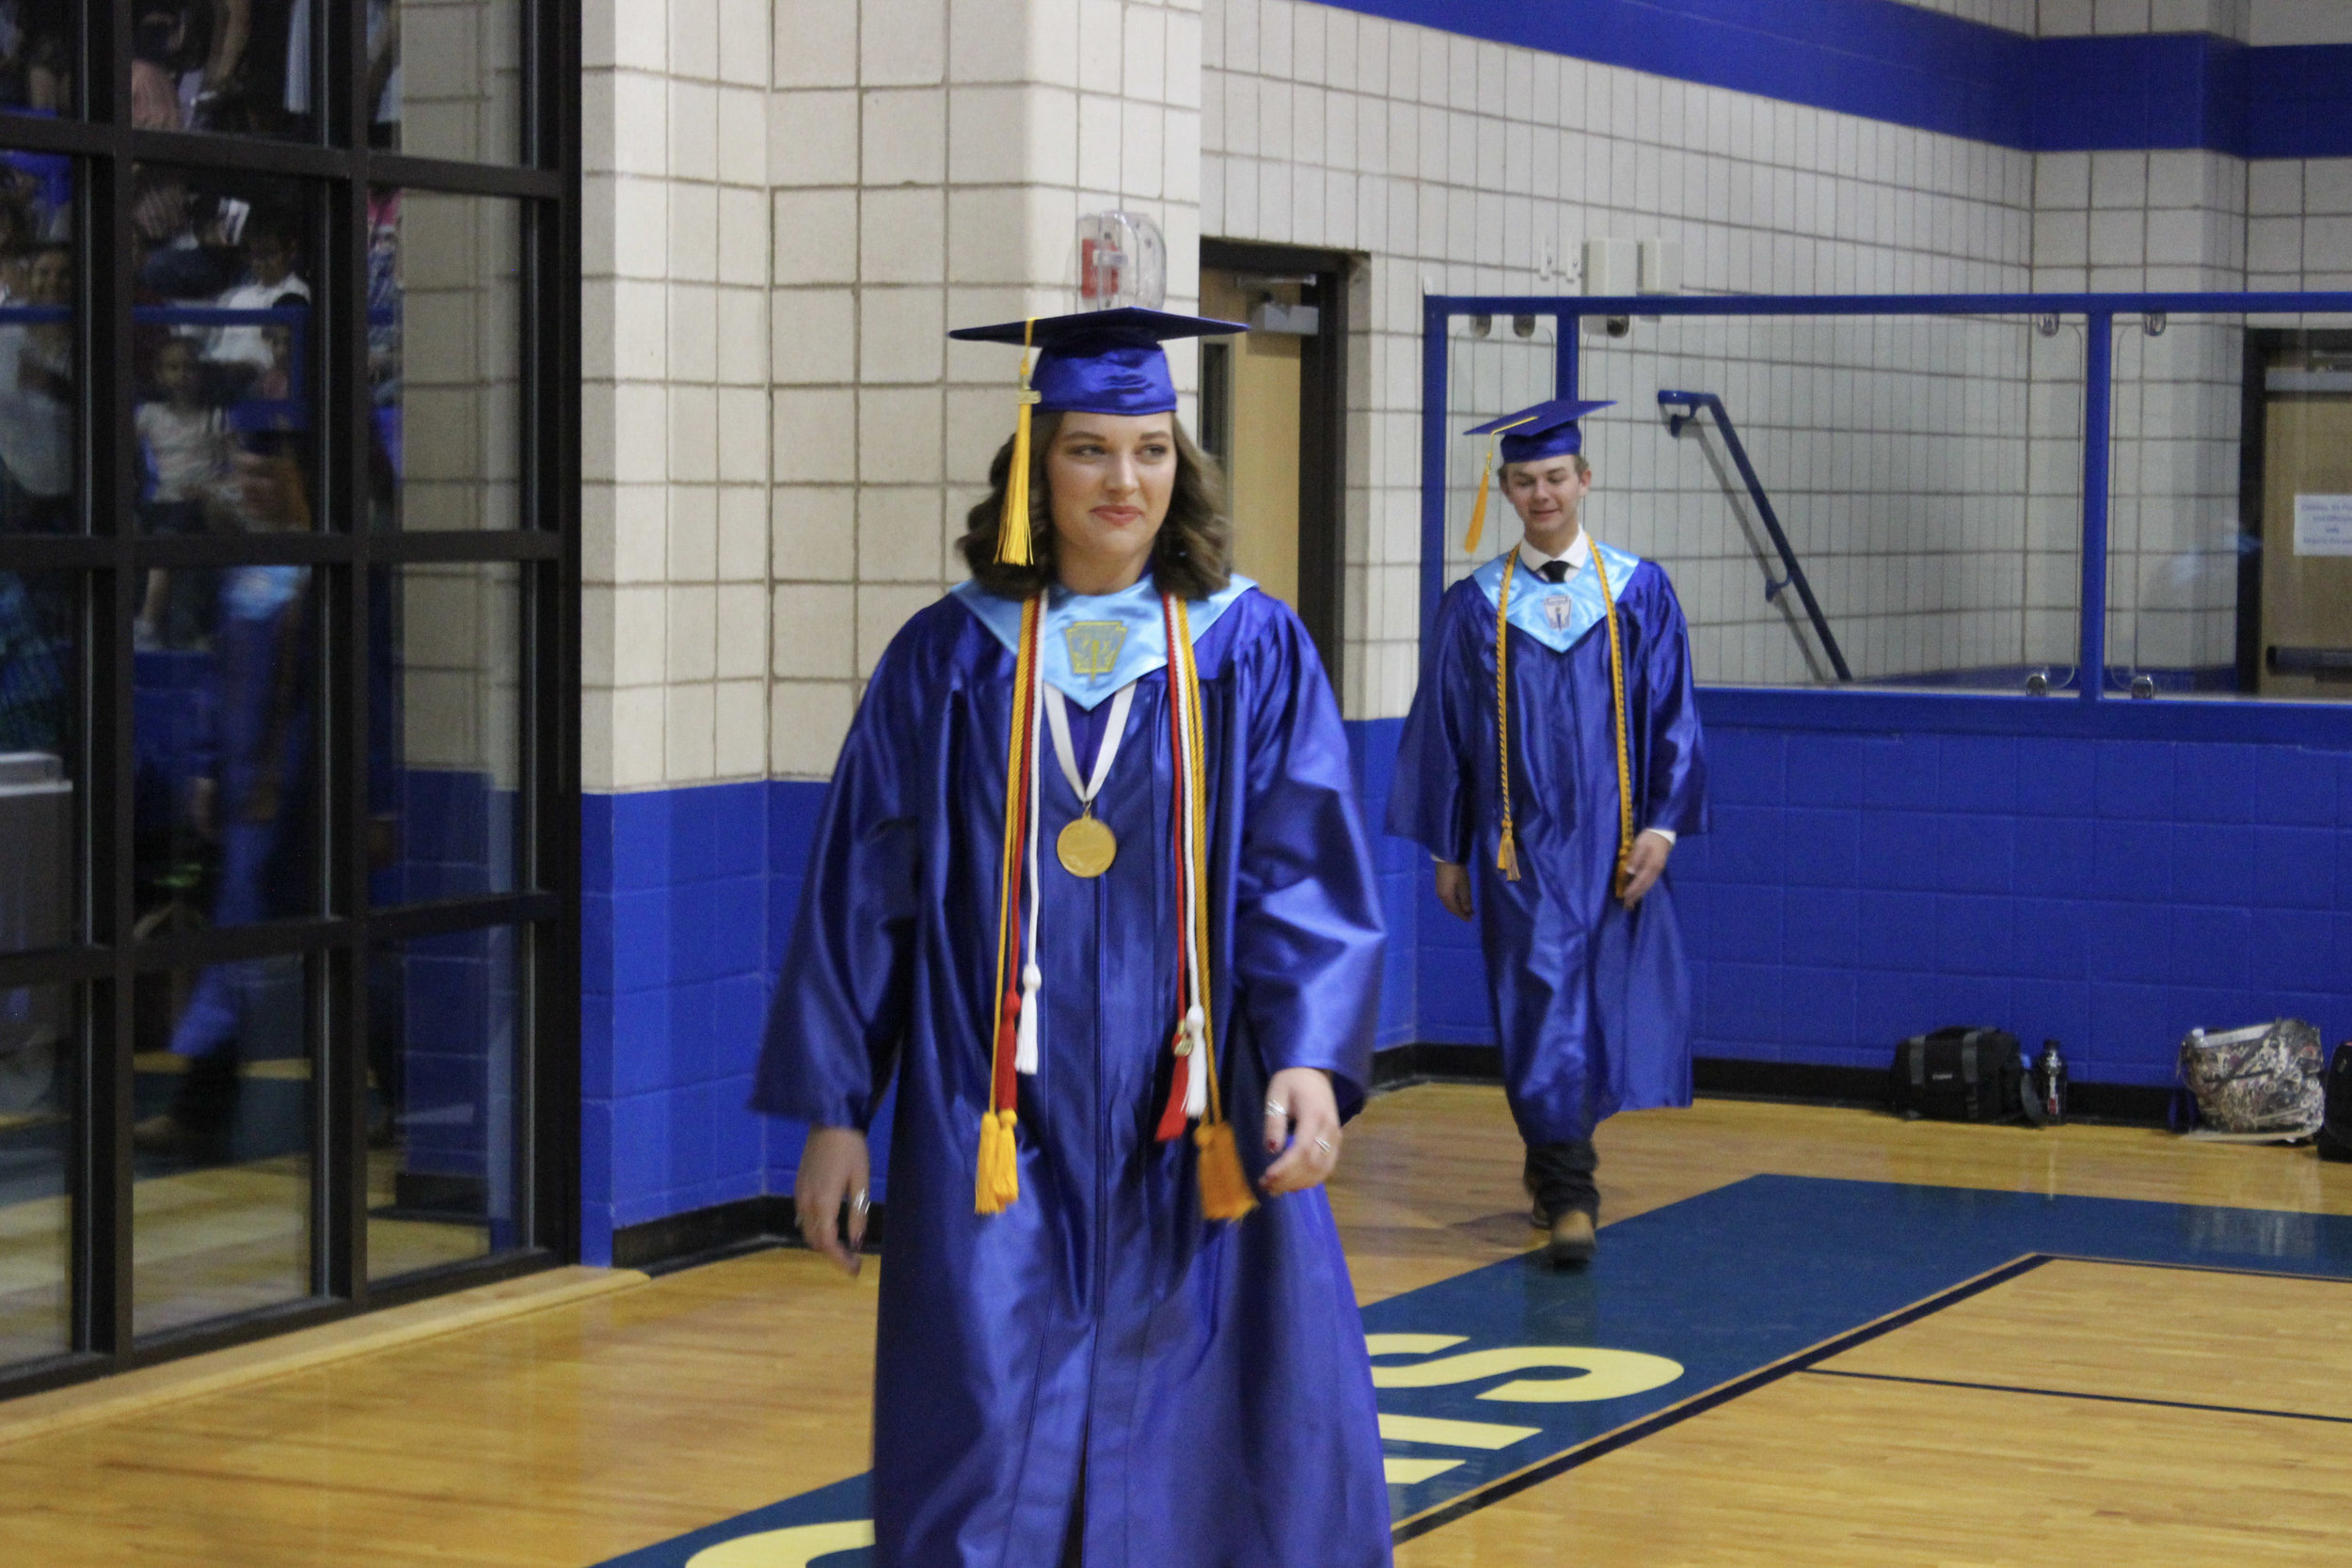 Senior Graduate From Coleman High School